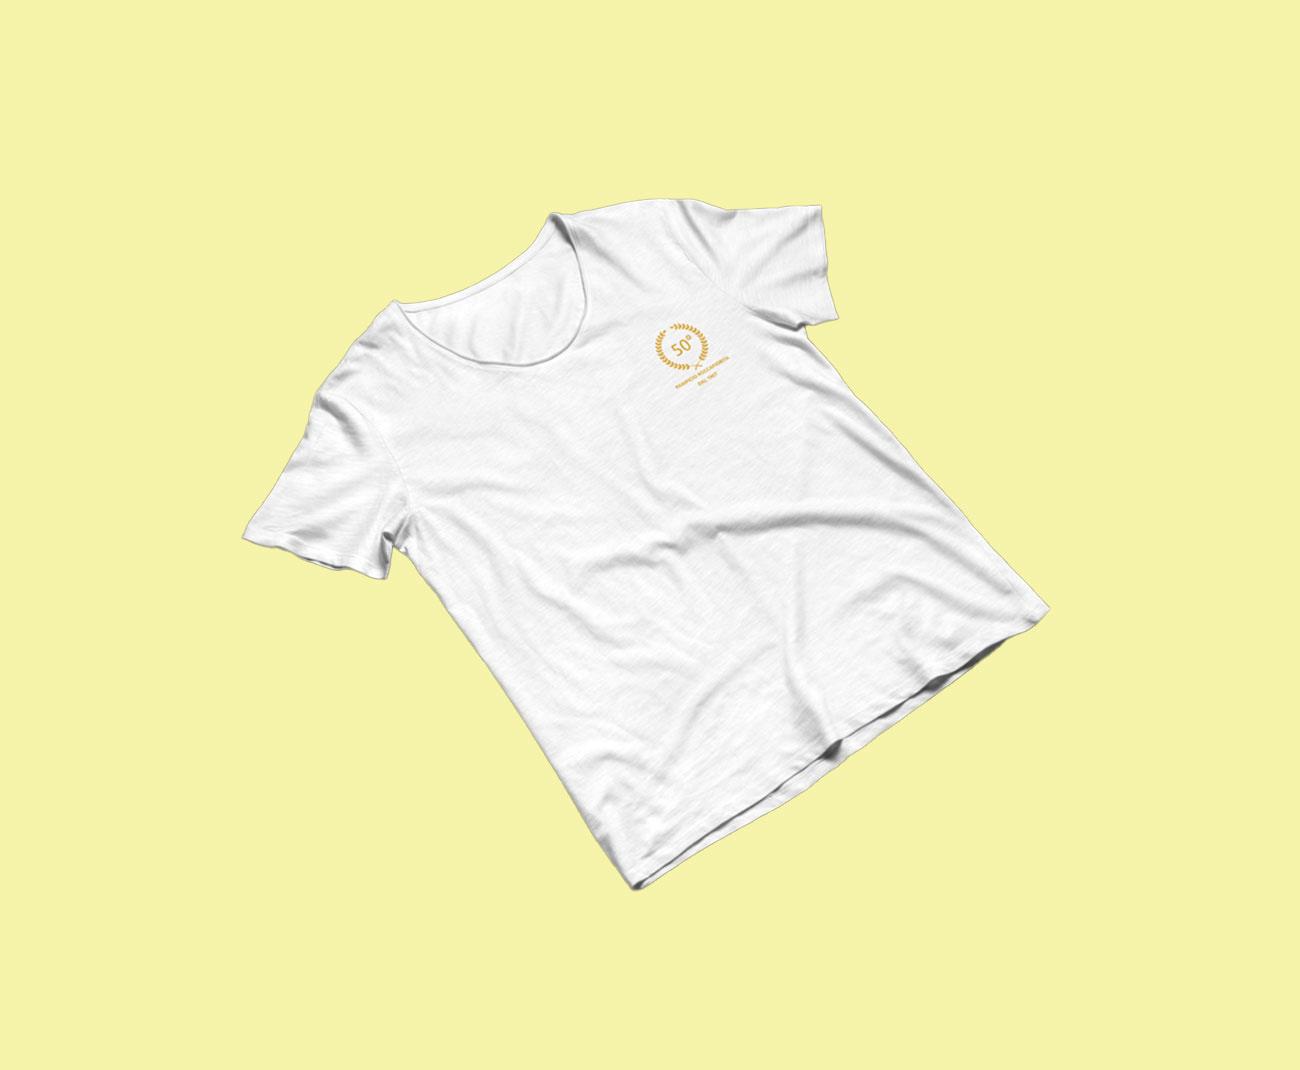 tshirt-forno-roccafiorita-anniversario